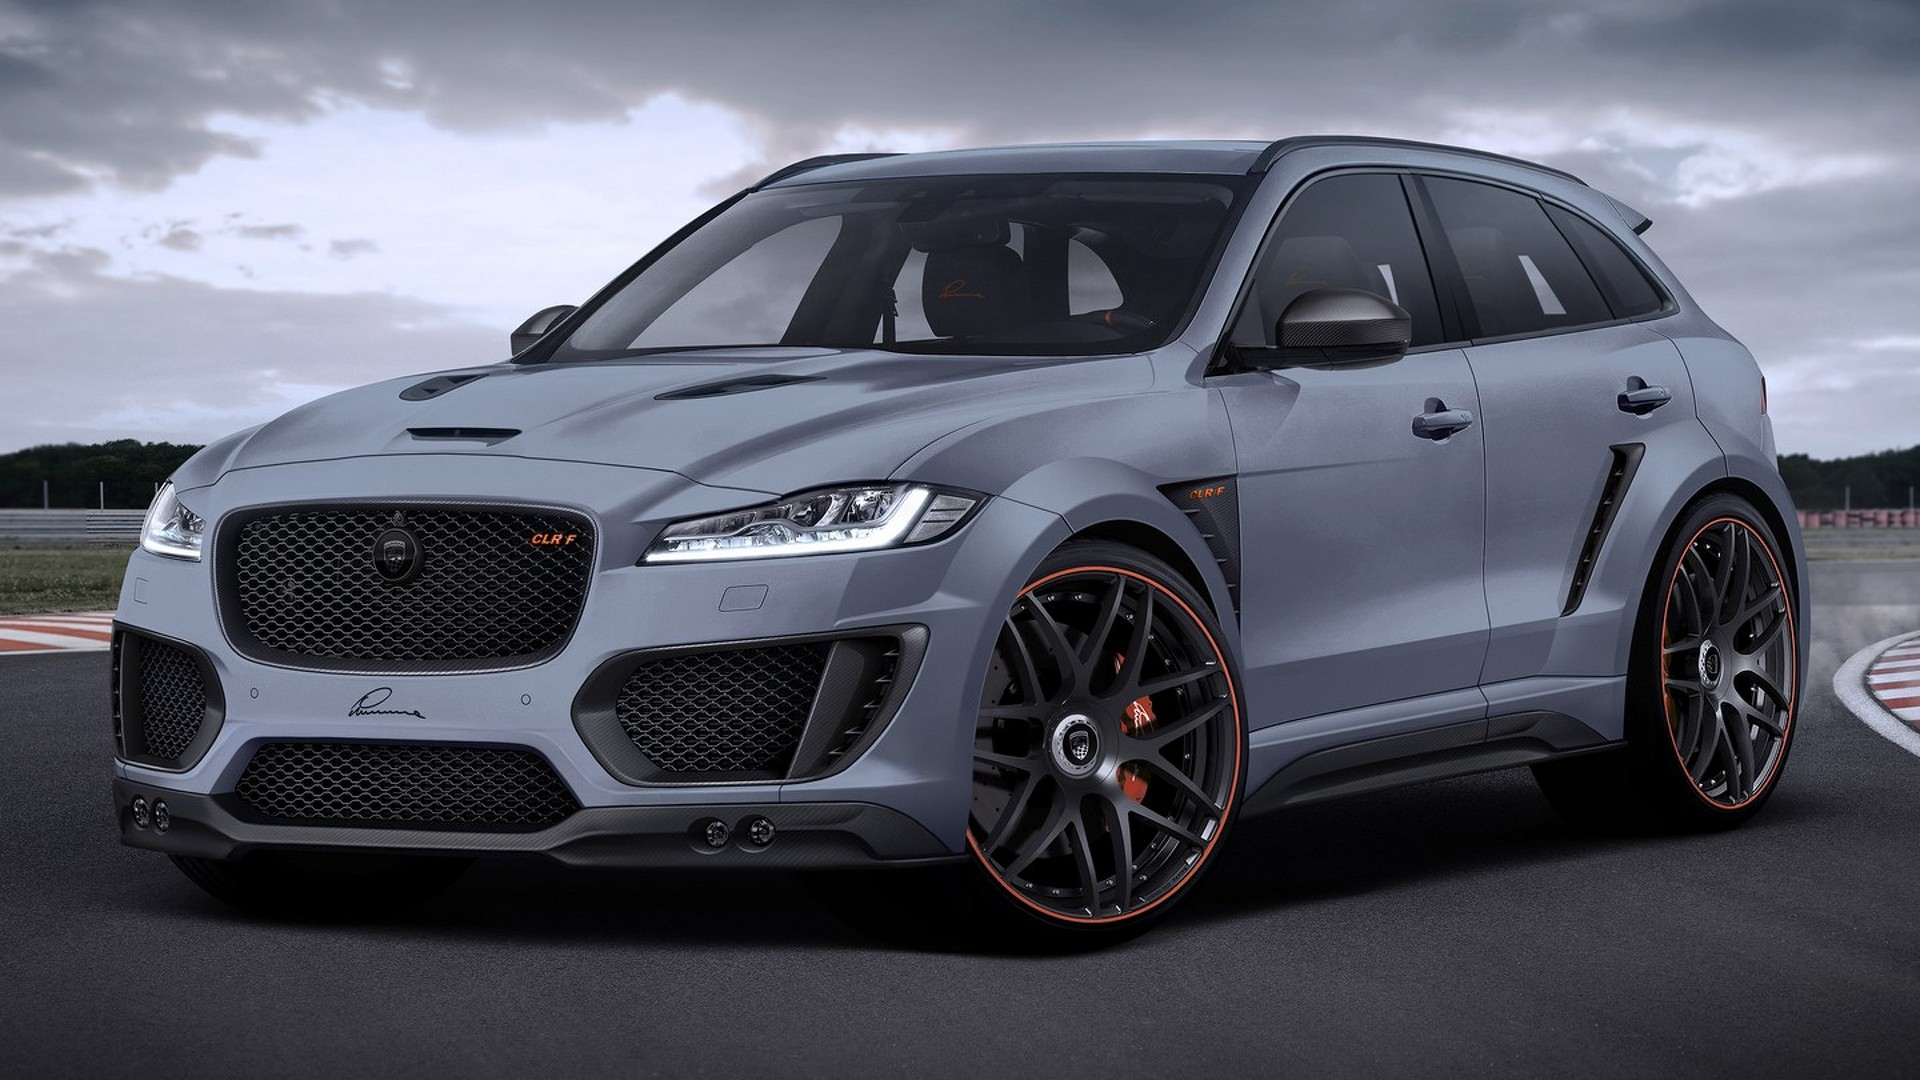 Lumma Design Spices Up Jaguar F Pace With 24 Inch Wheels